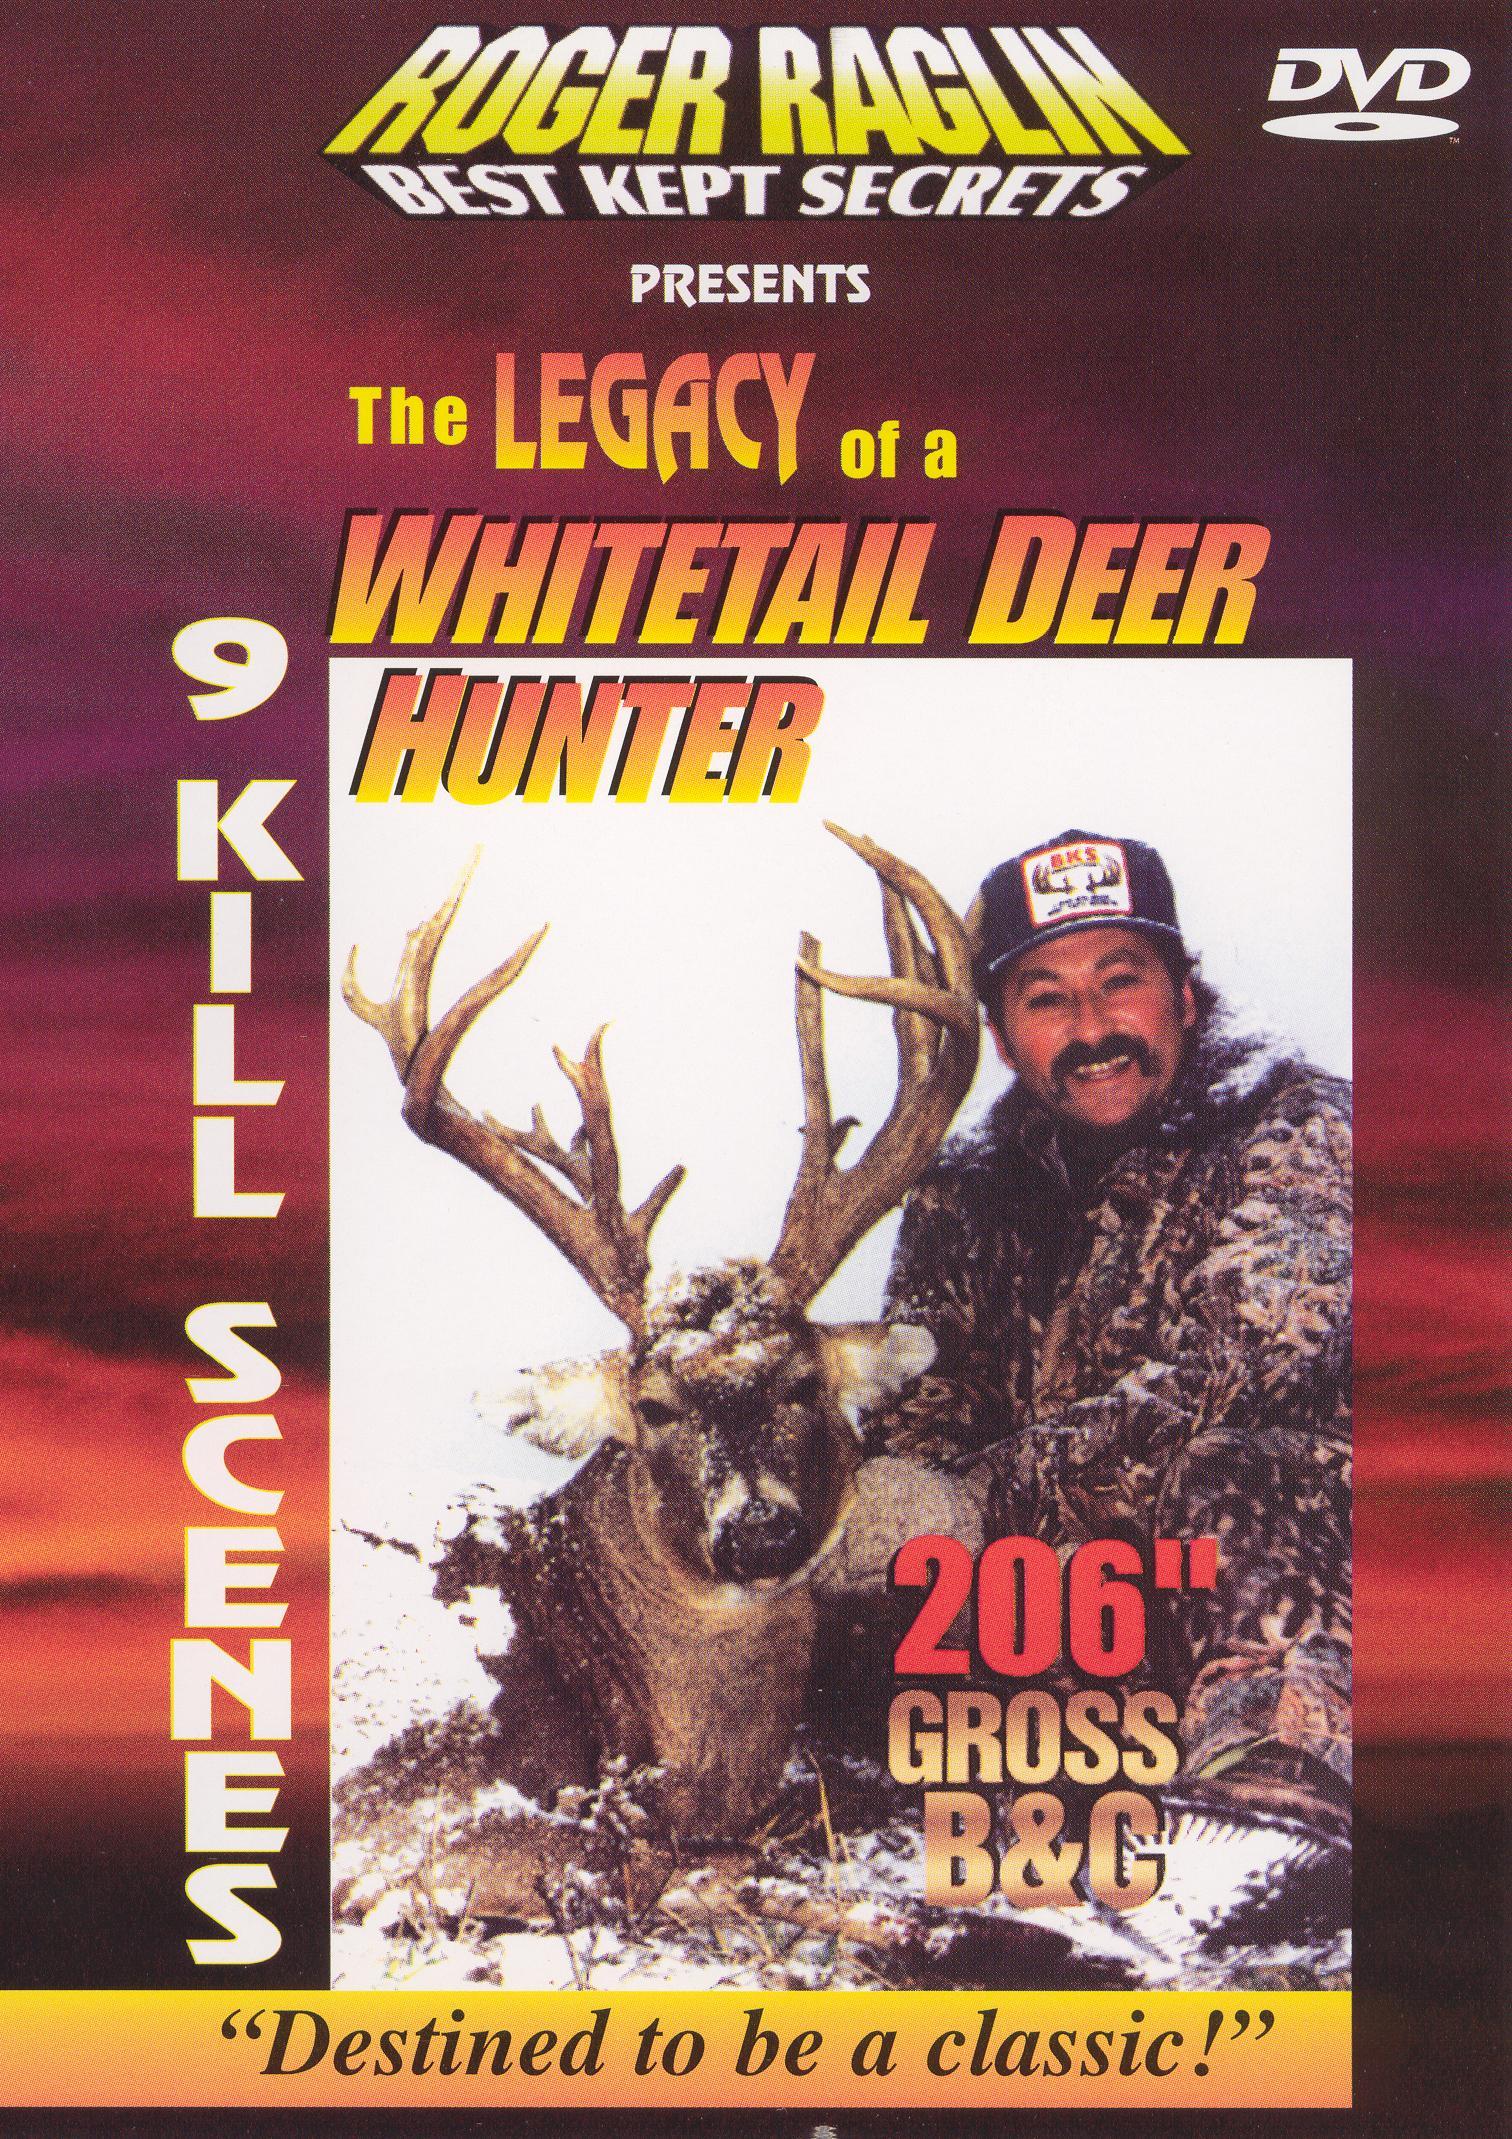 Roger Raglin: Best Kept Secrets - Legacy of a Whitetail Deer Hunter